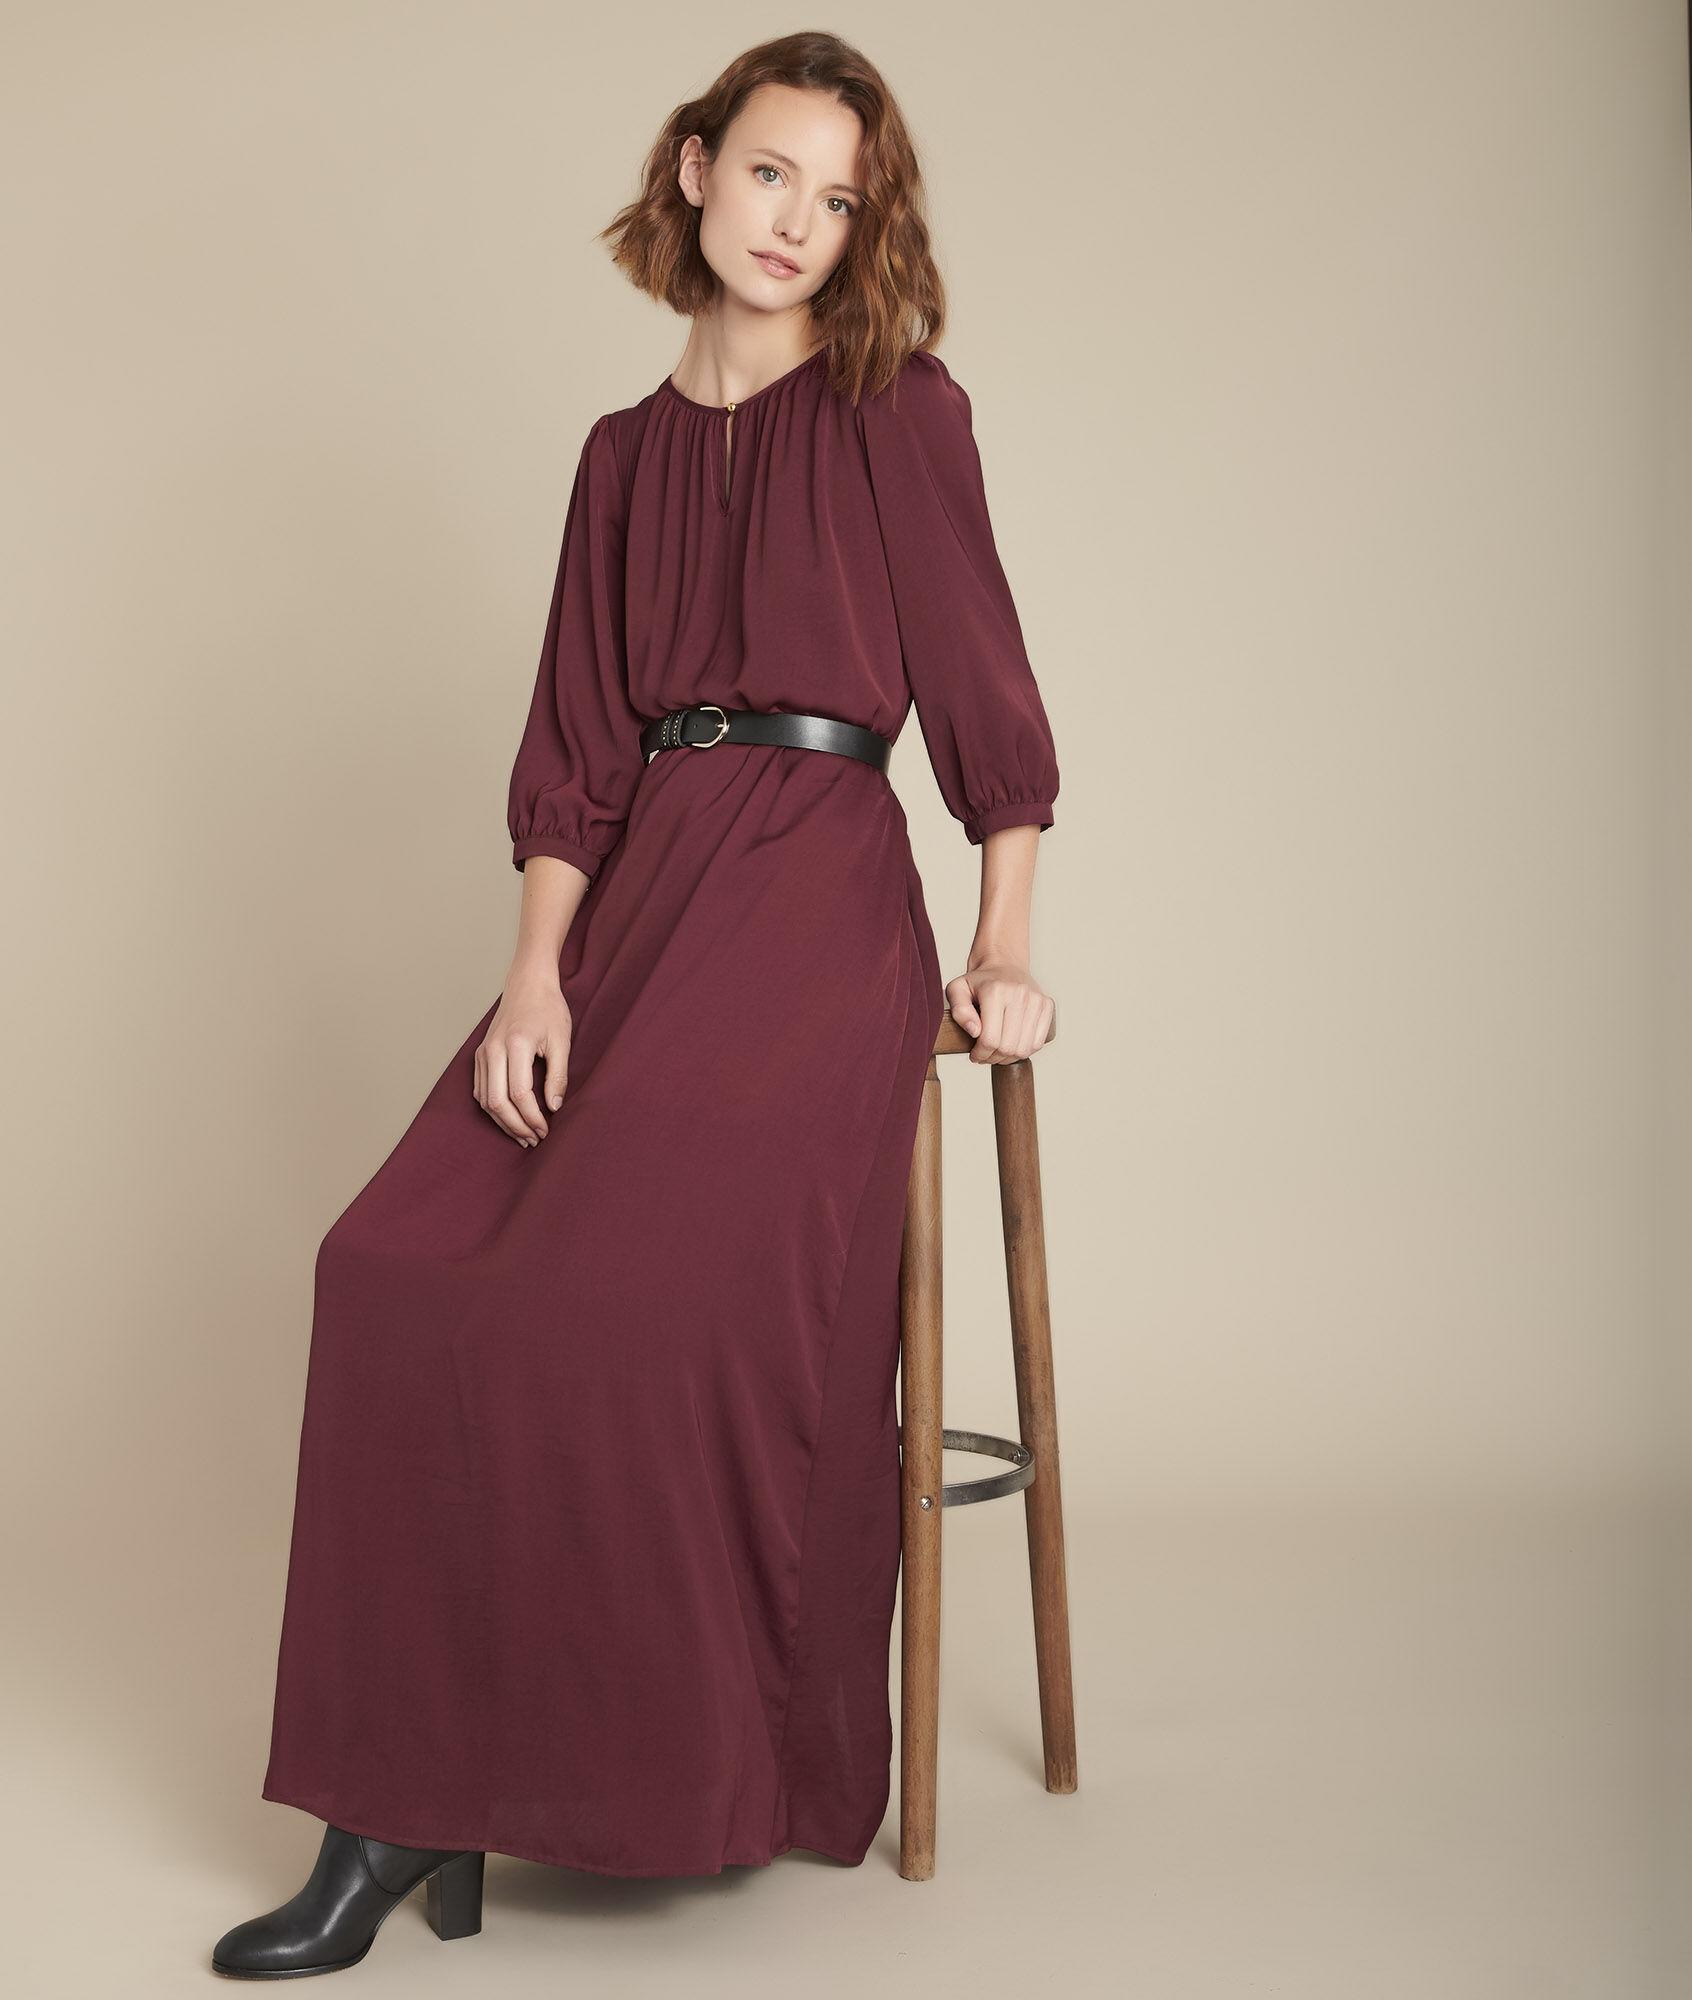 Ivana Fließend Kleid Kleid Langes Granatrot Langes L435jAR